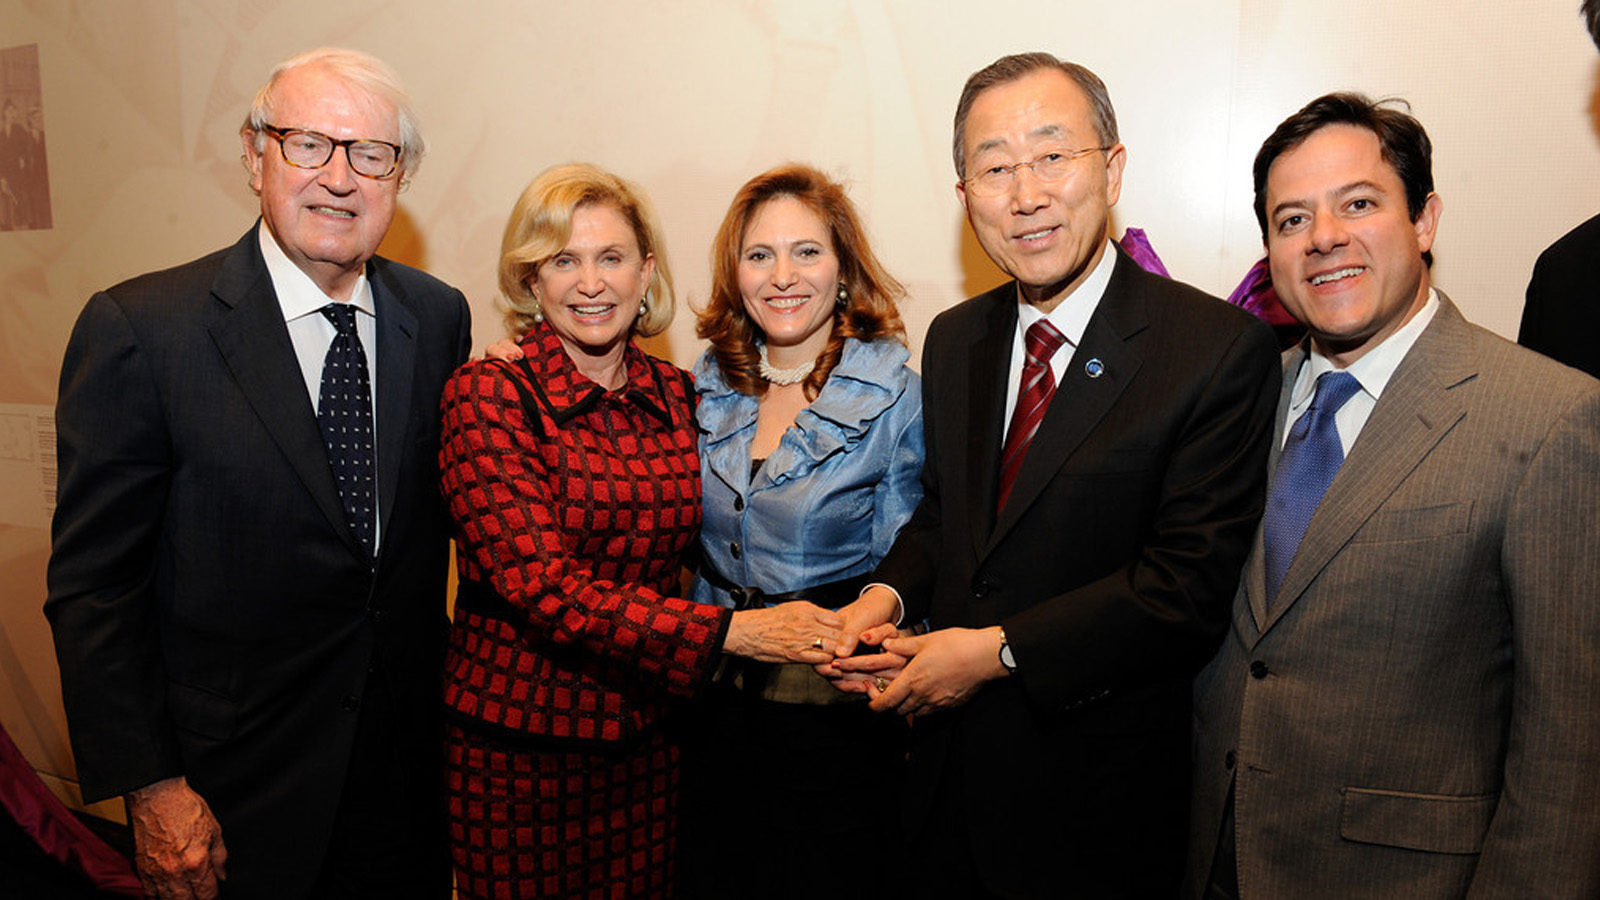 U.N secretary Ban Ki-moon at The Roosevelt House